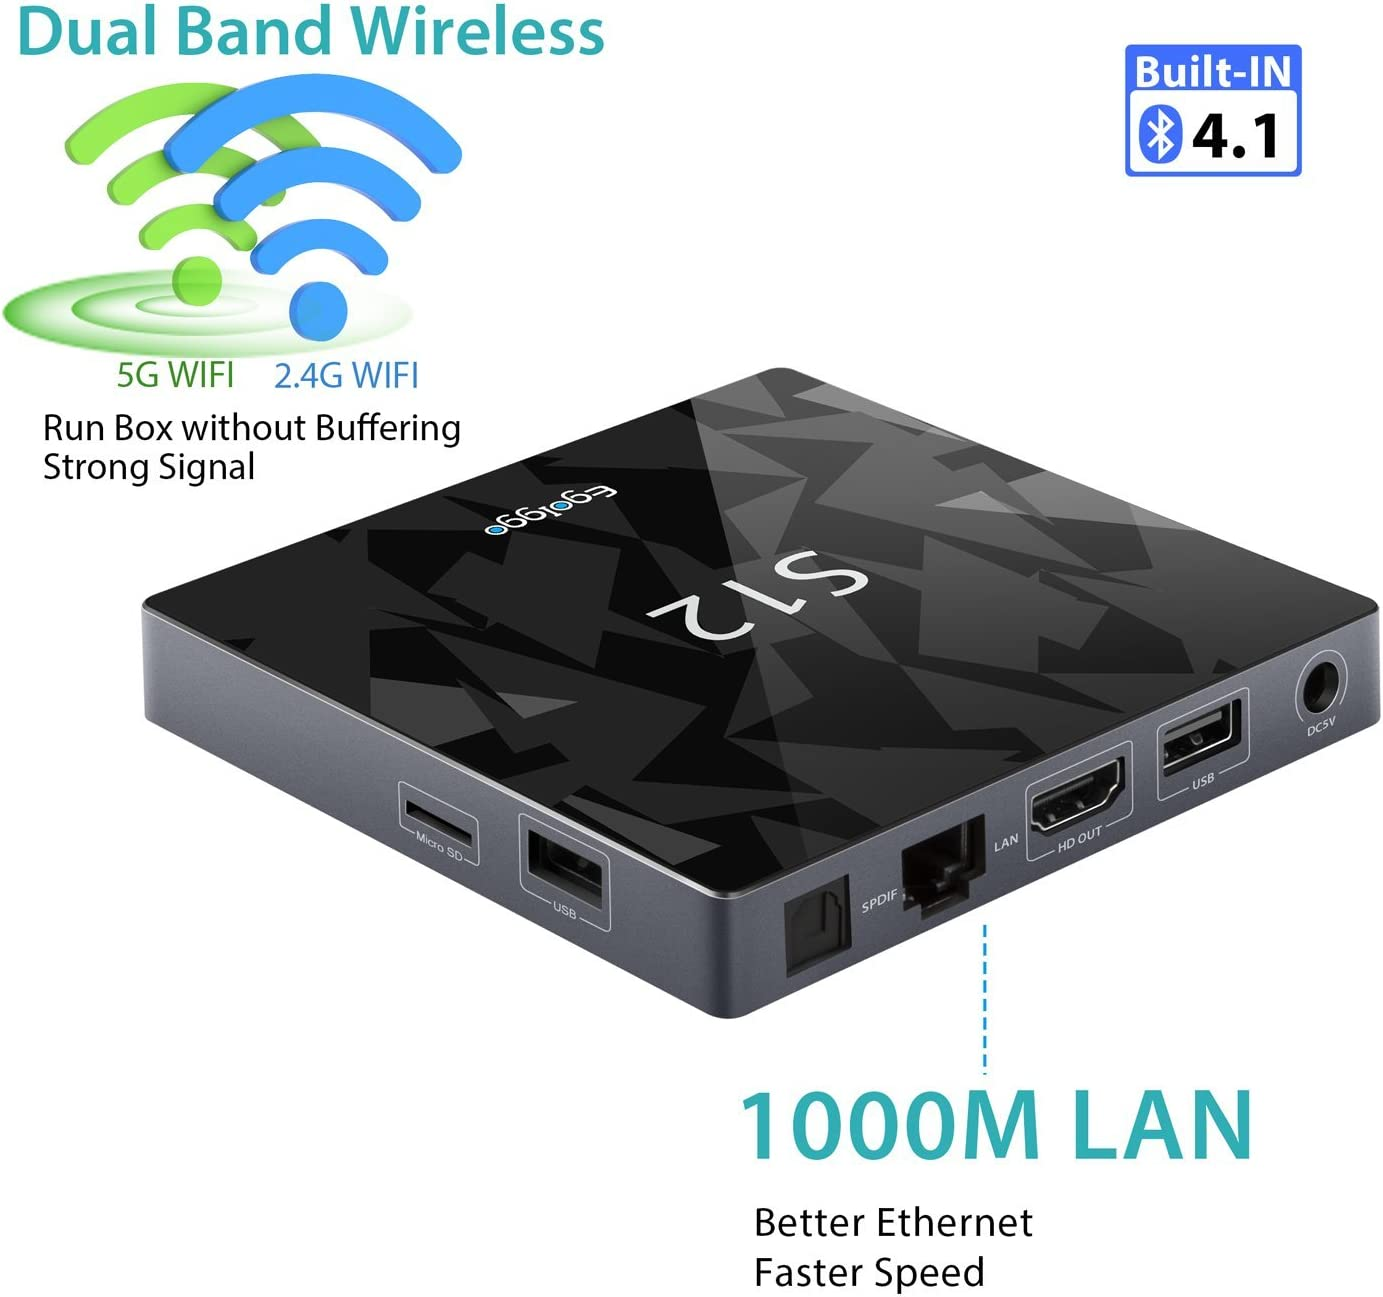 Android 6.0 TV Box-TICTID S12 android box Amlogic S912 Qcta Core Arm Cortex-A53 CPU / 2G DDR3 + 16G Emmc/2.4G+5G WiFi / 1000M LAN/Bluetooth 4.1 /4K Smart Box: Amazon.es: Electrónica